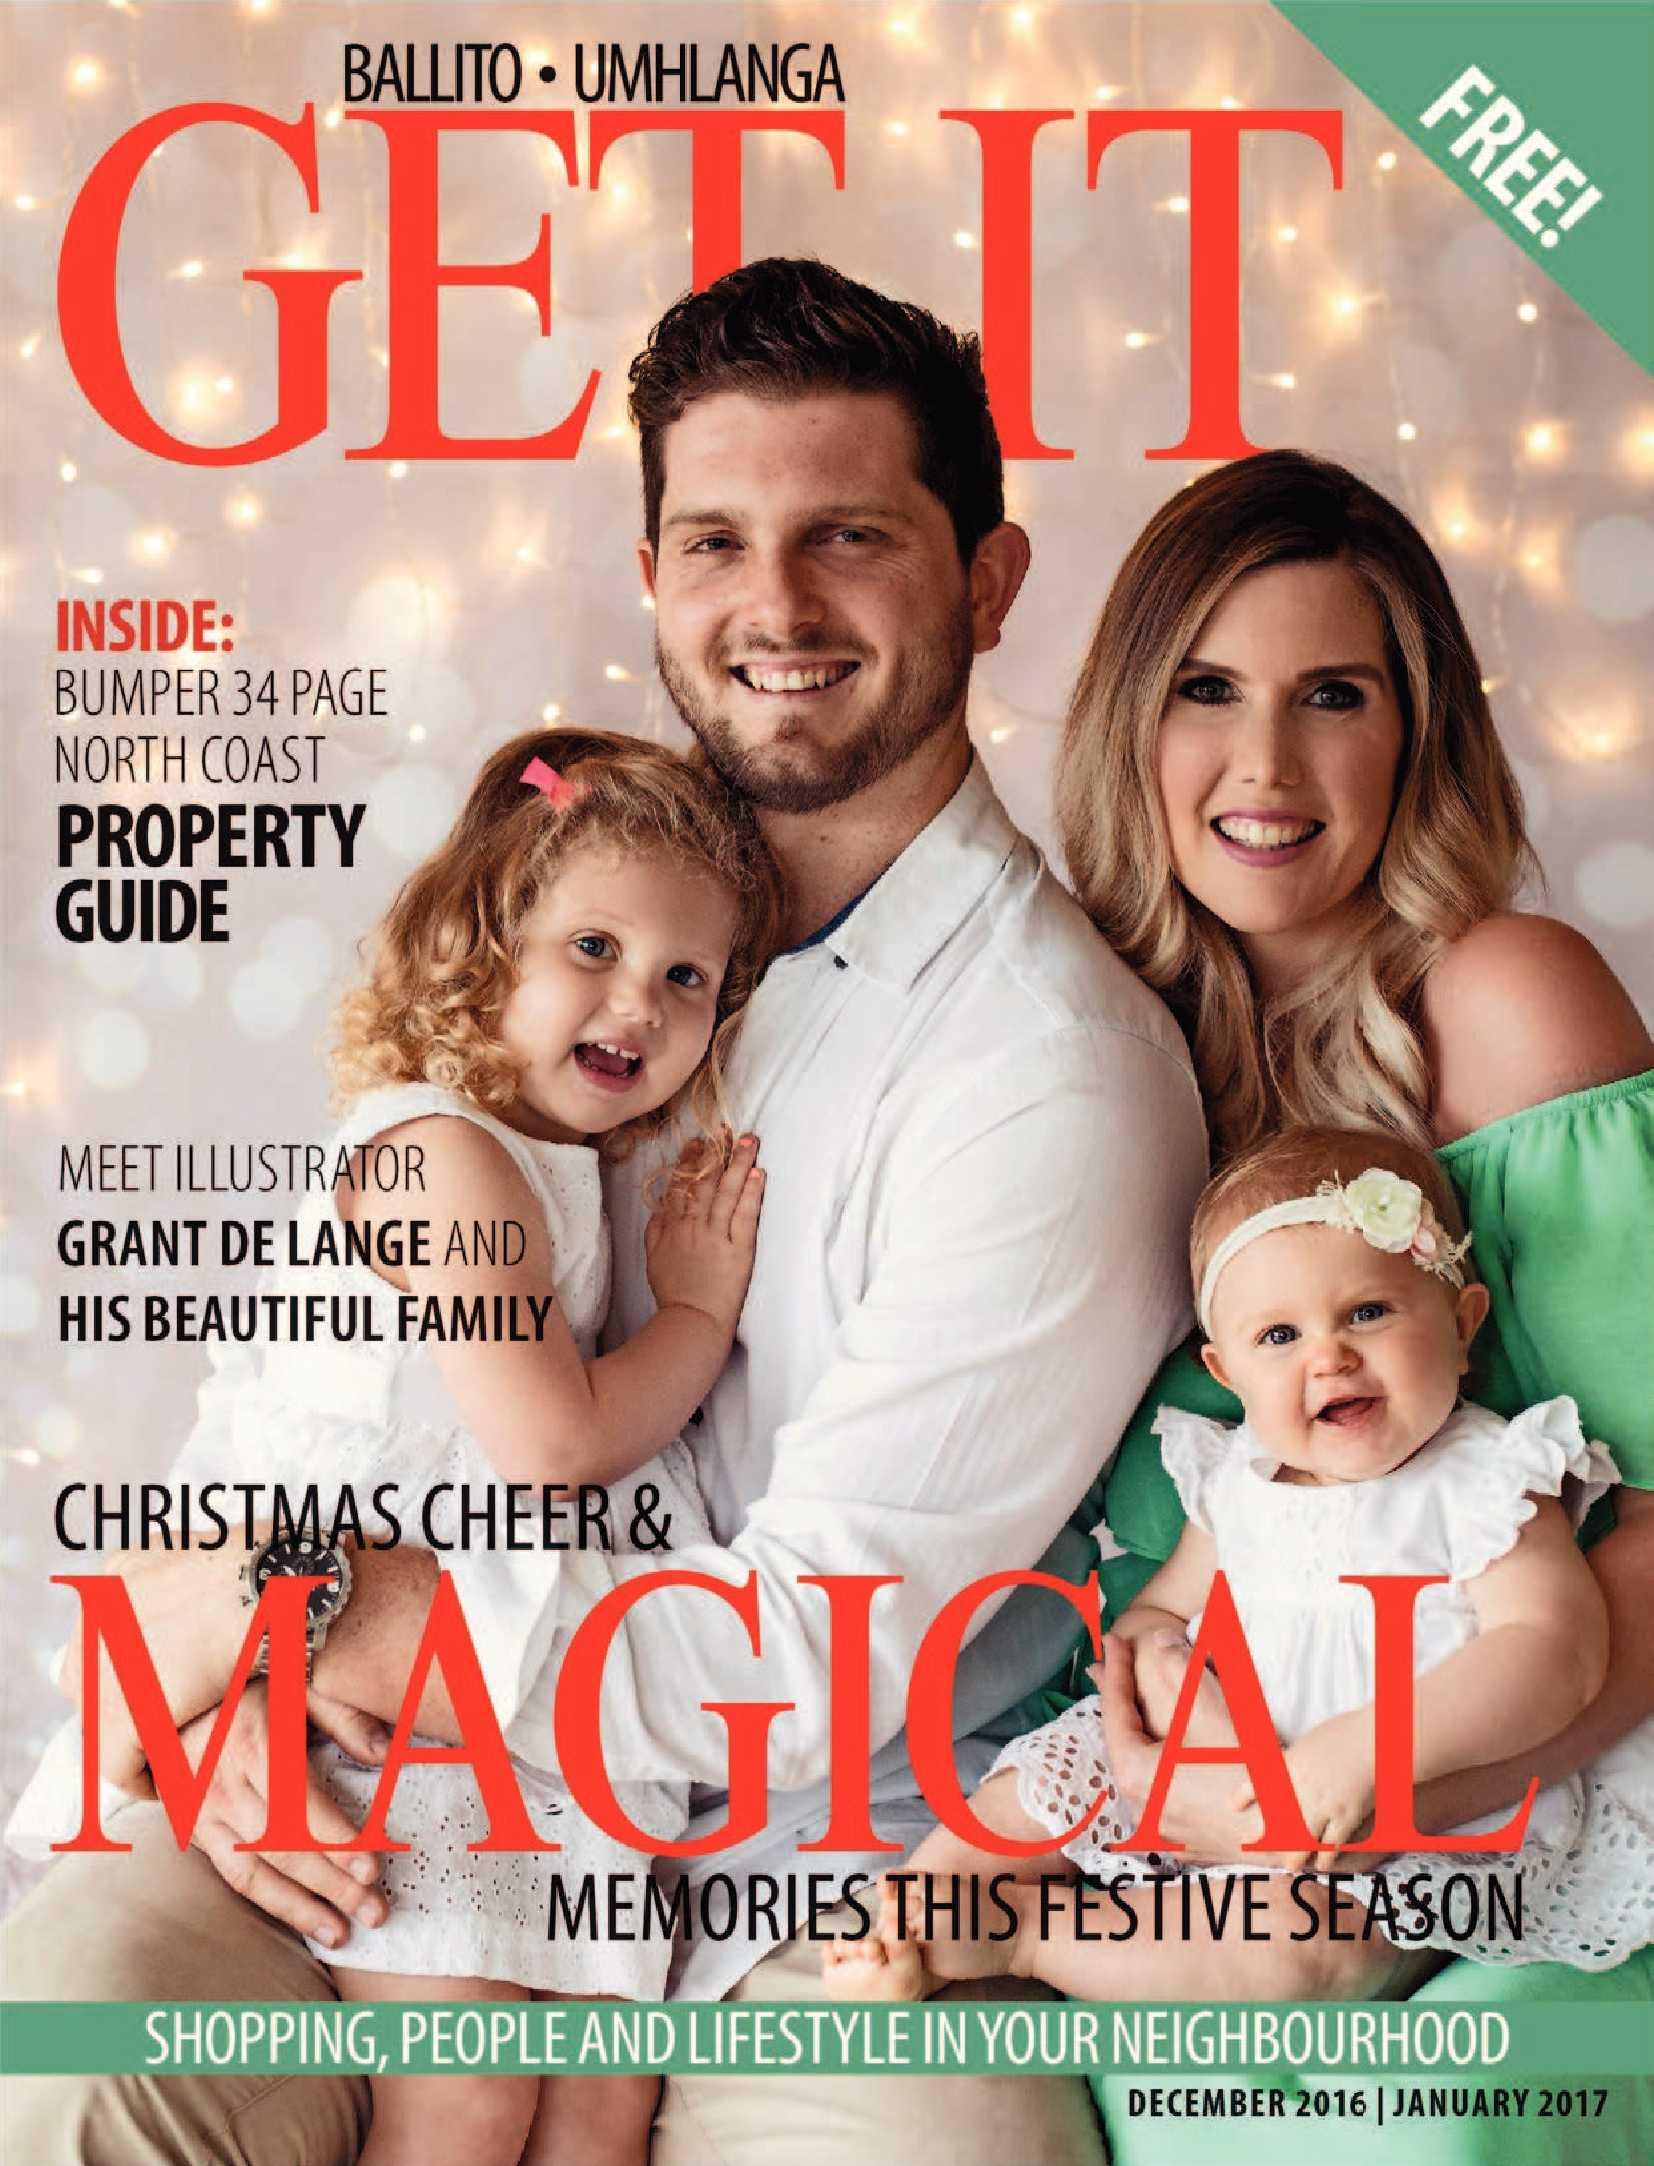 get-magazine-ballitoumhlanga-december-2016-january-2017-epapers-page-1